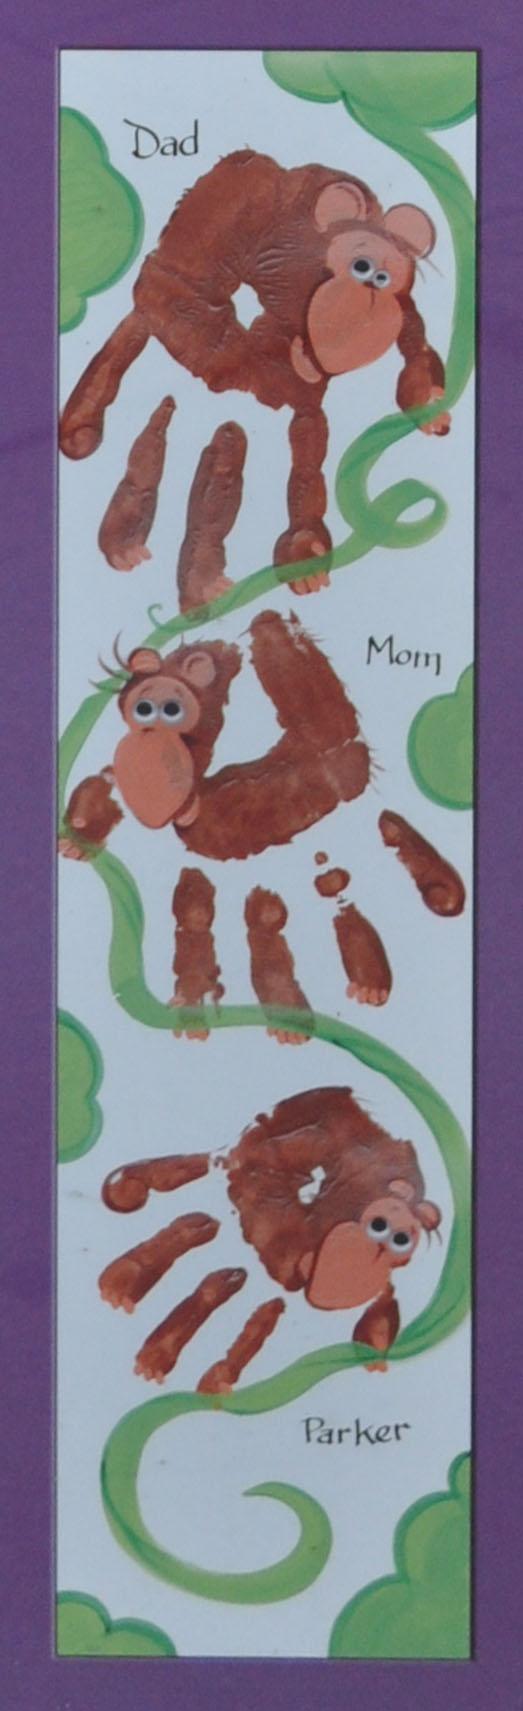 Monkey handprints | Handprint Crafts | Pinterest | Monkey, Craft and ...